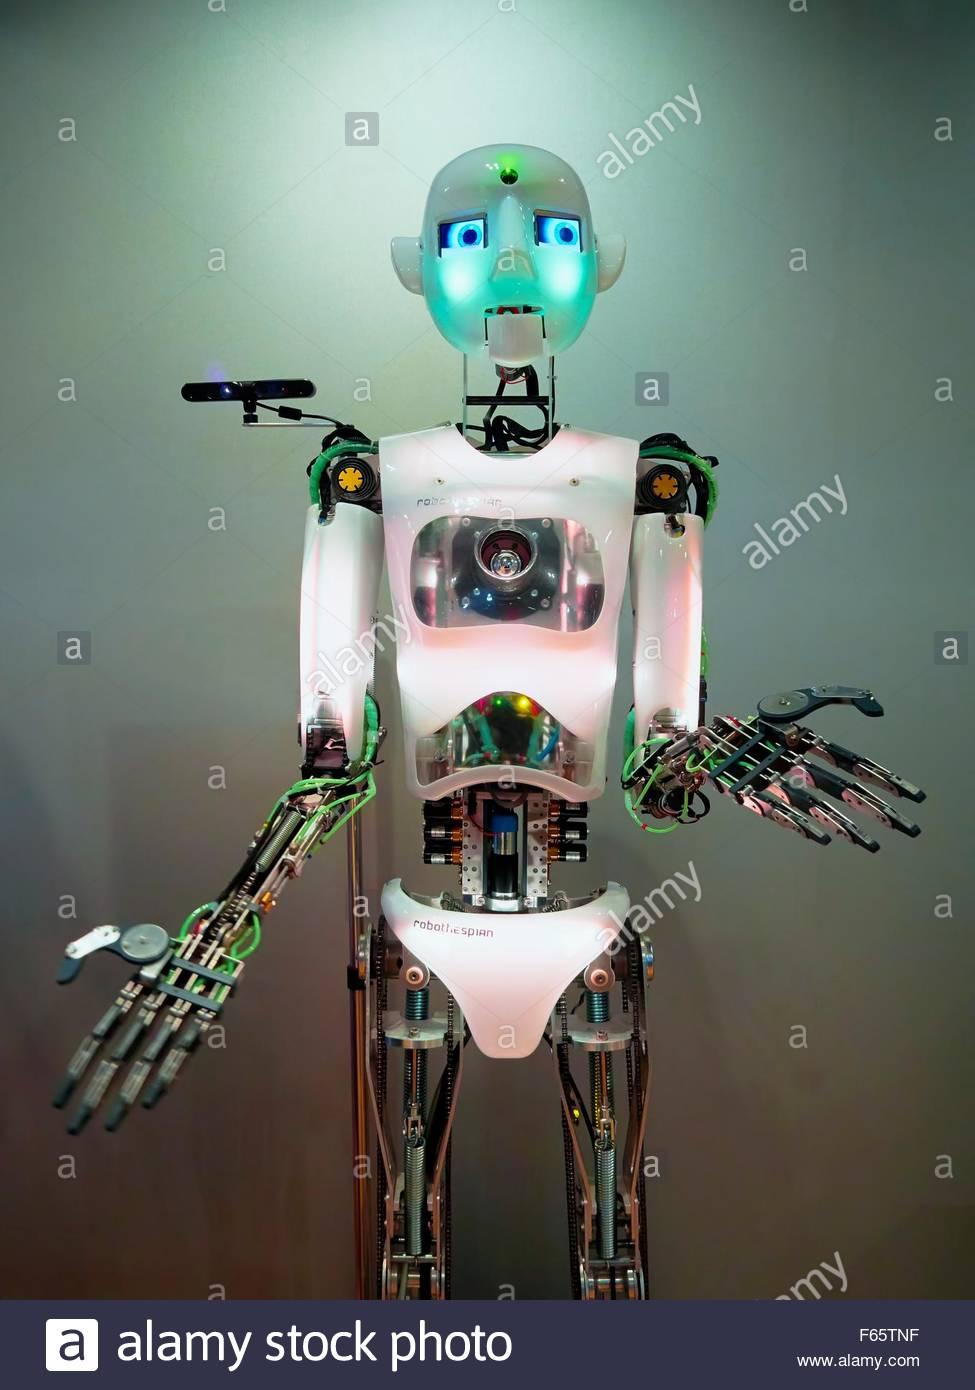 A robot at the Hans Nixdorf Forum, Paderborn - Stock Image